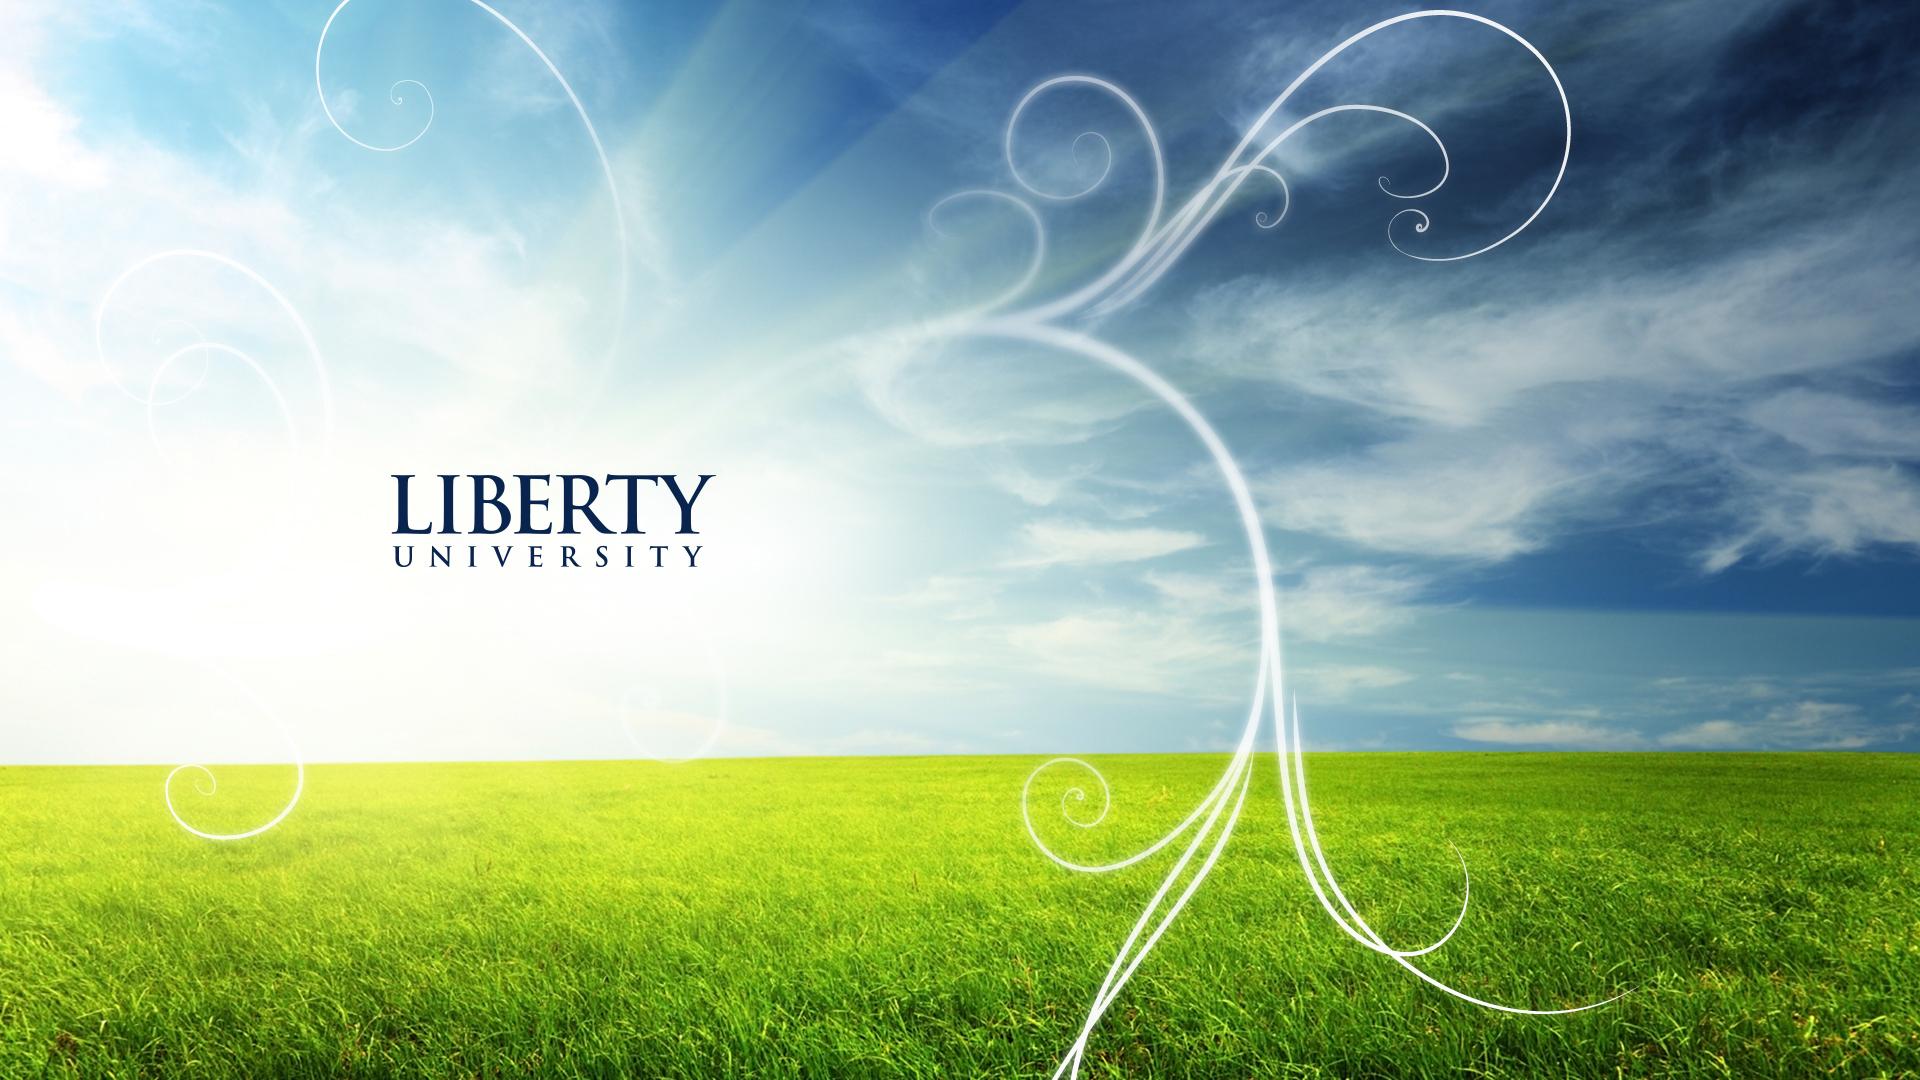 Background Images Marketing Department Liberty University 1920x1080